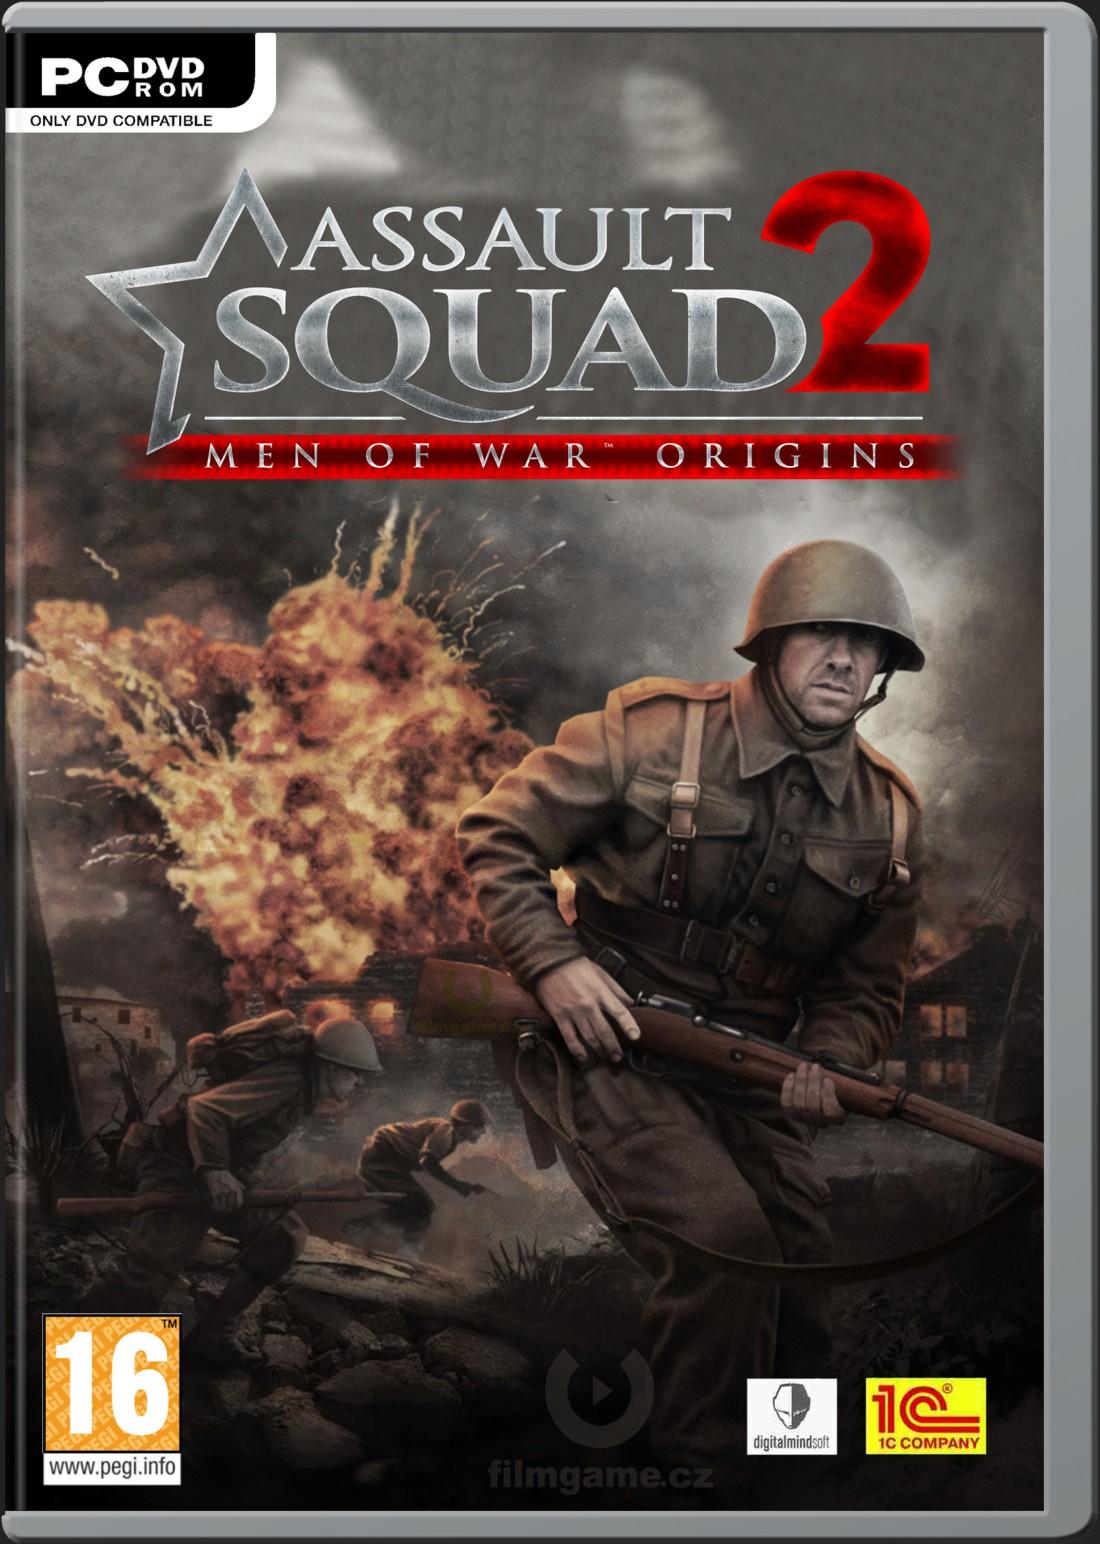 ASSAULT SQUAD 2: MEN OF WAR ORIGINS - PC